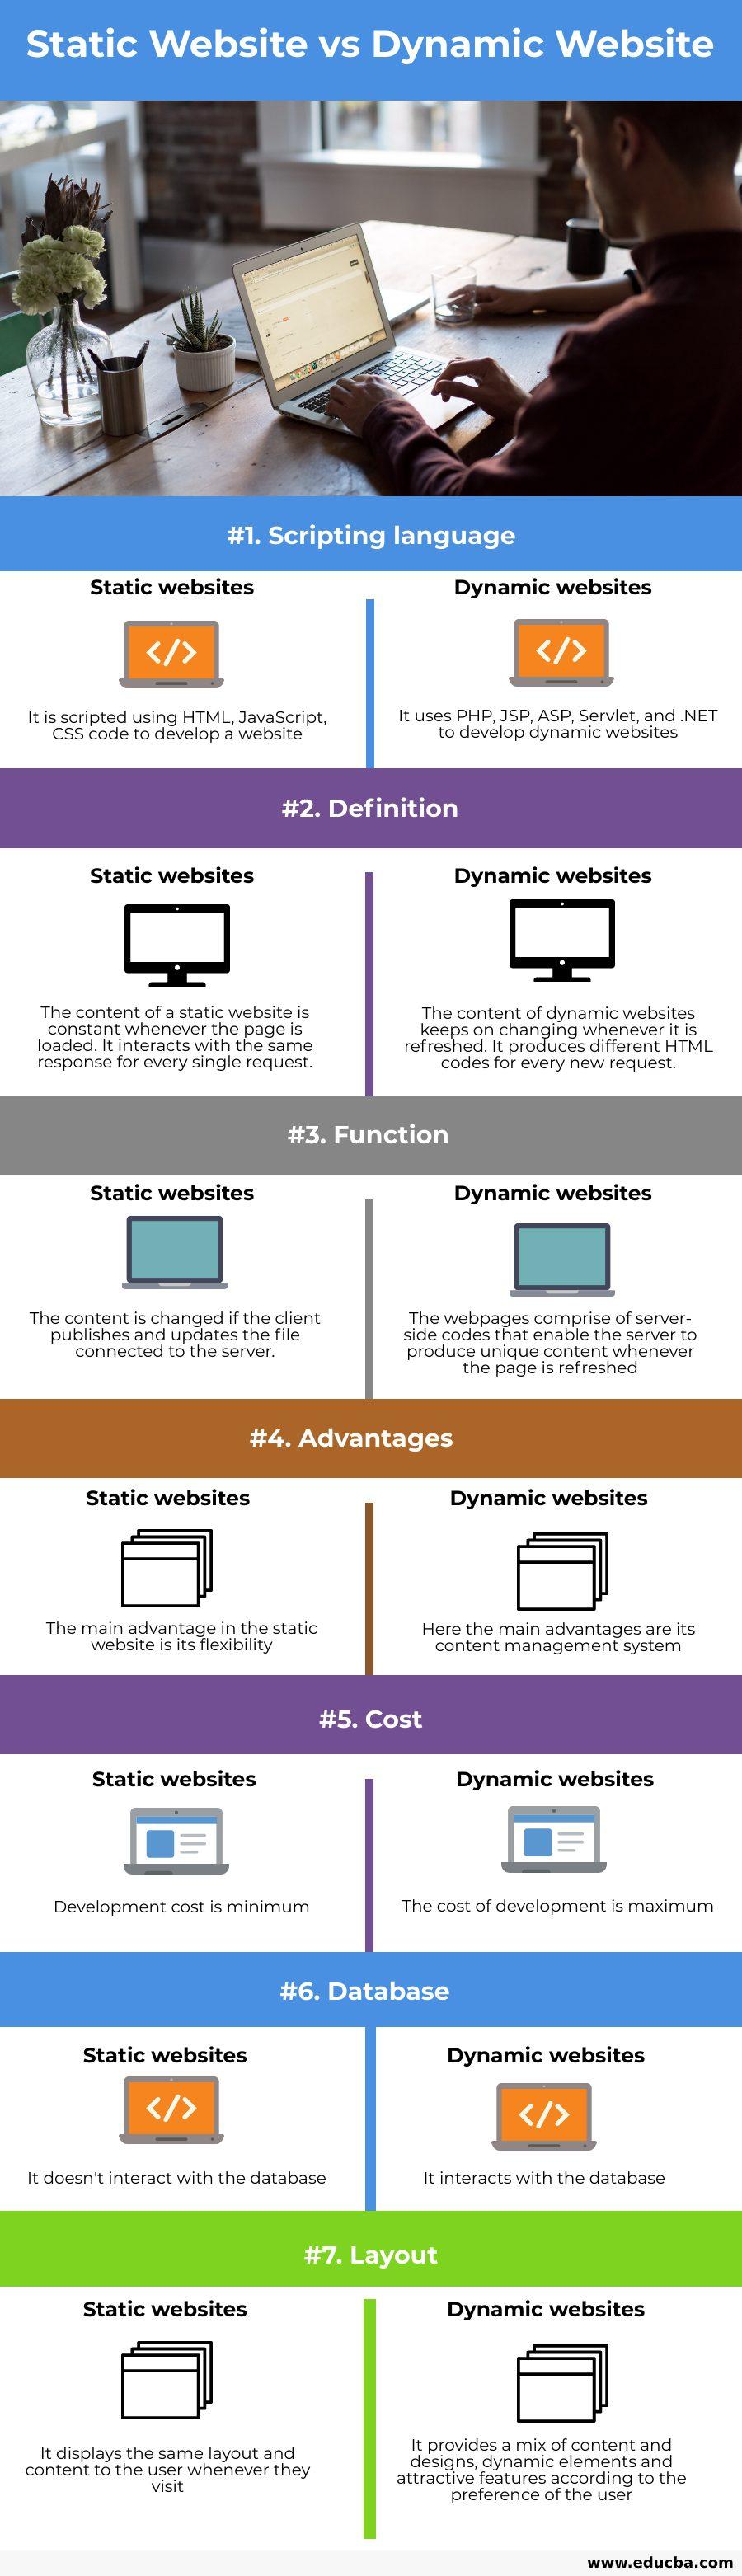 Static Website vs Dynamic Website_info